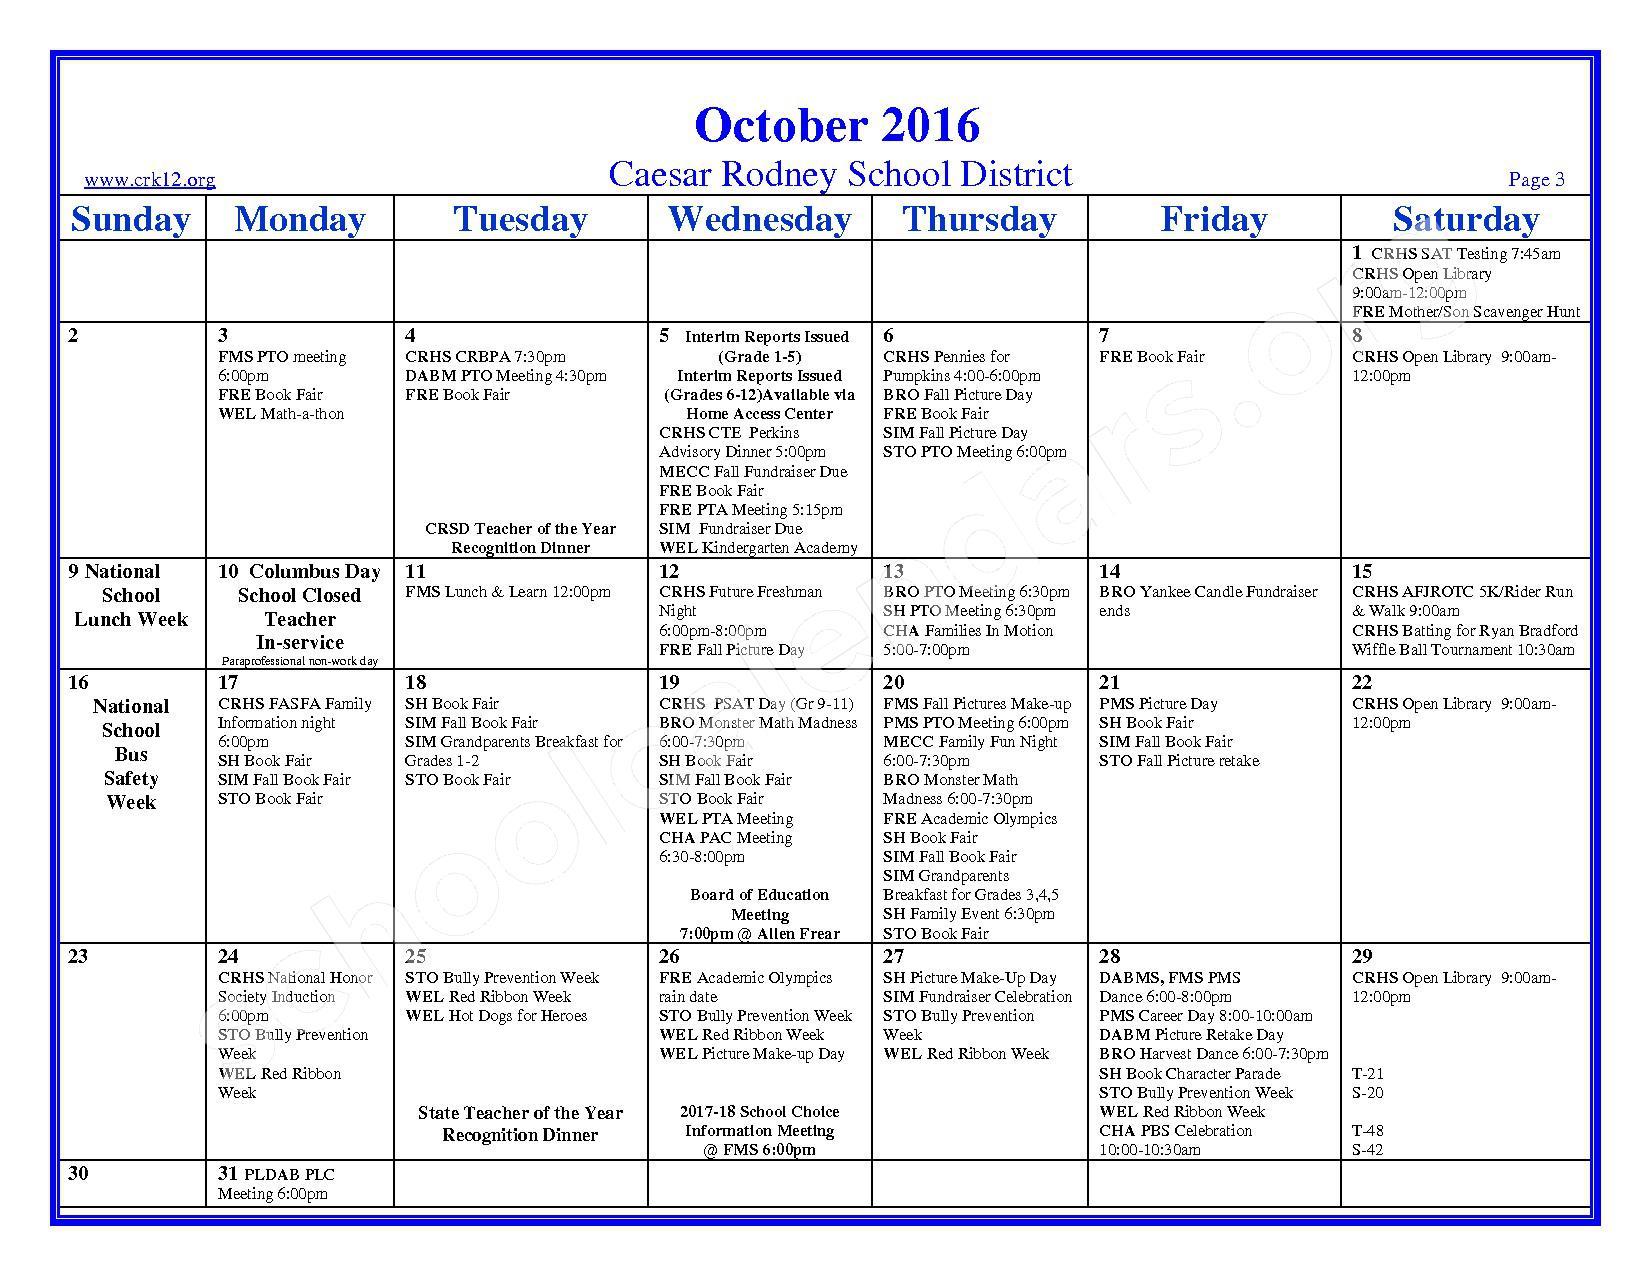 2016 - 2017 School Calendar – Brown (W. Reily) Elementary School – page 3